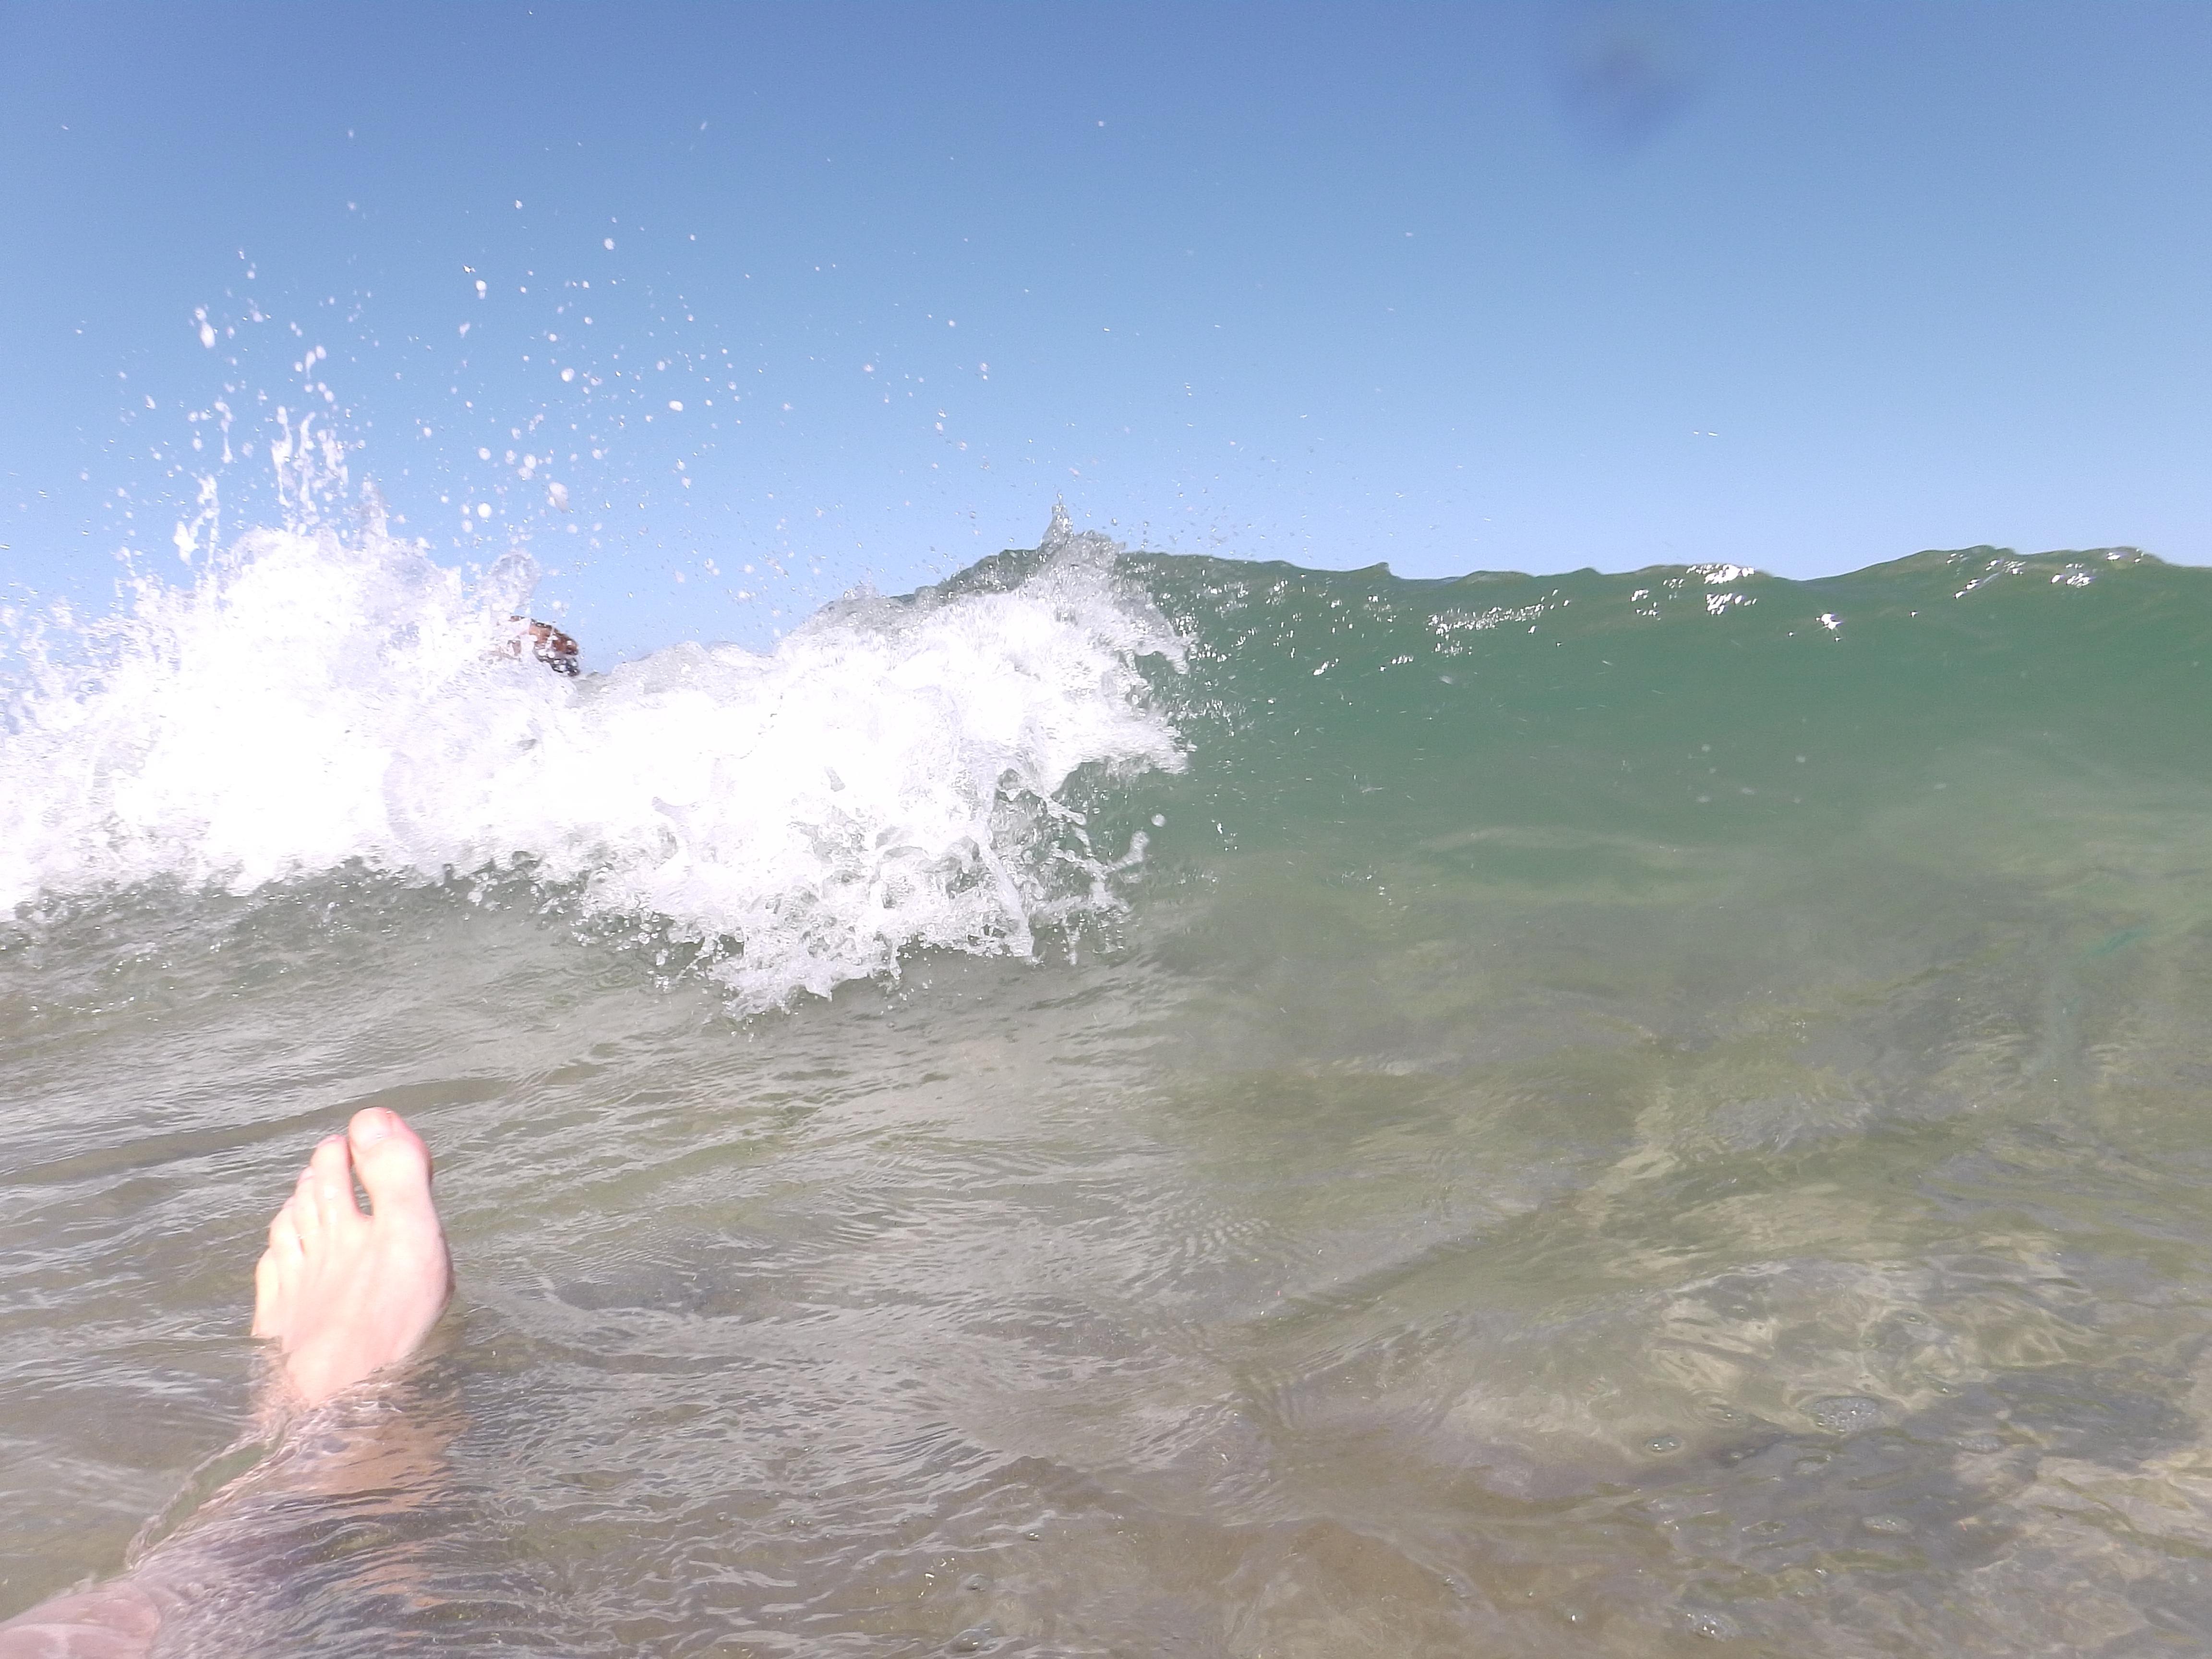 anrollende Welle